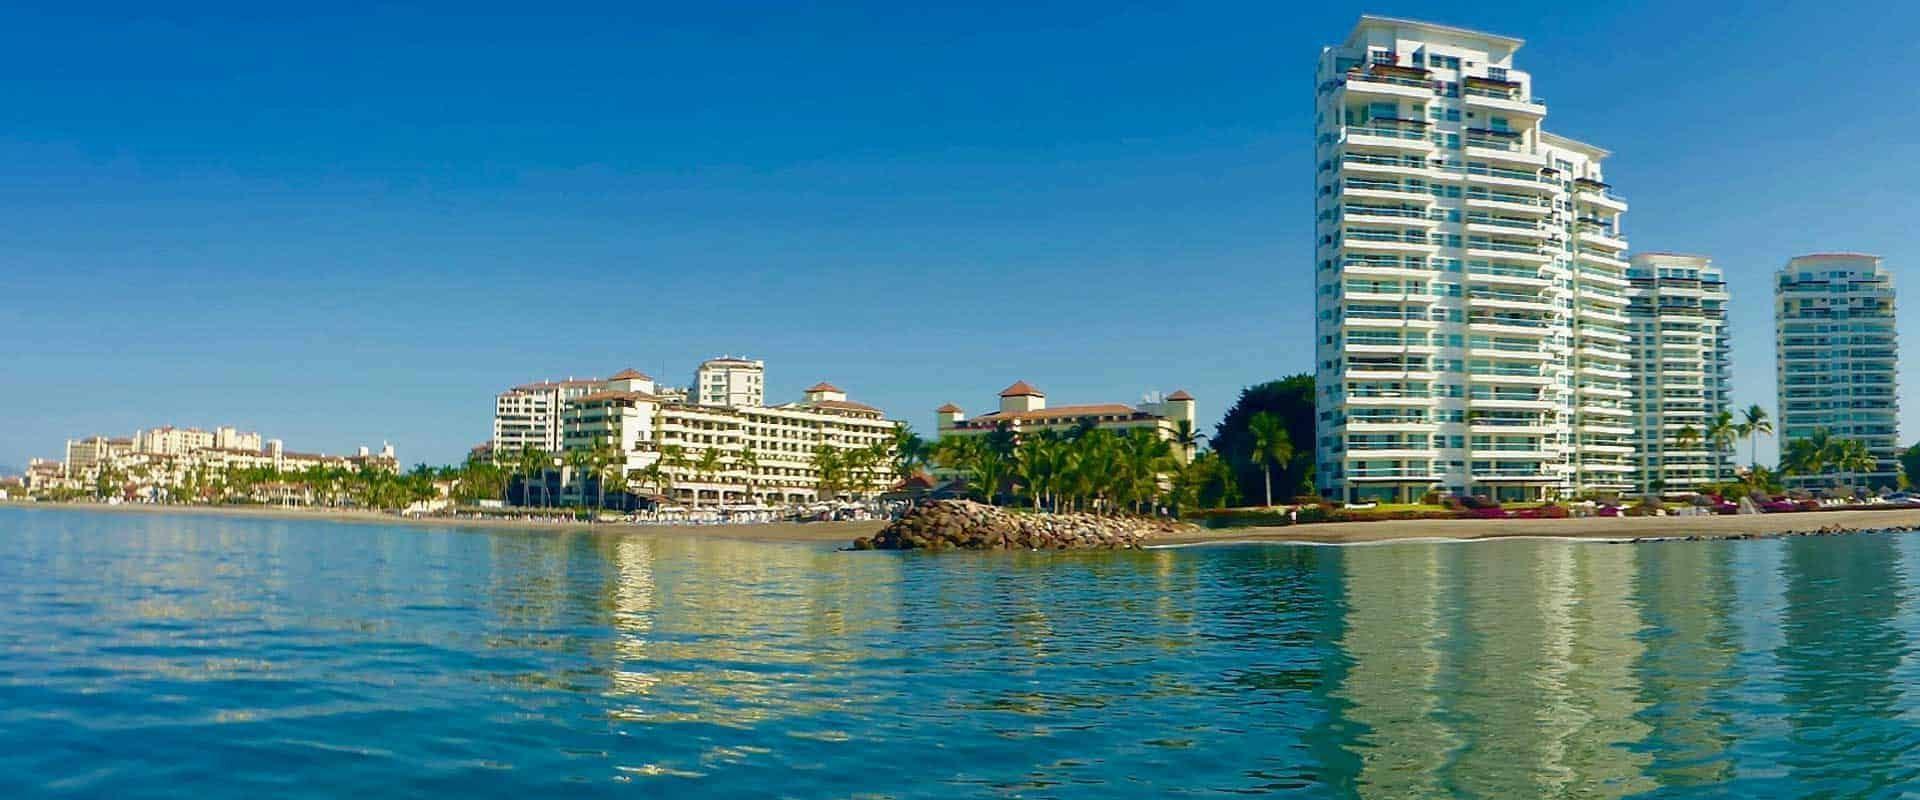 Value of Real Estate to the Puerto Vallarta Community